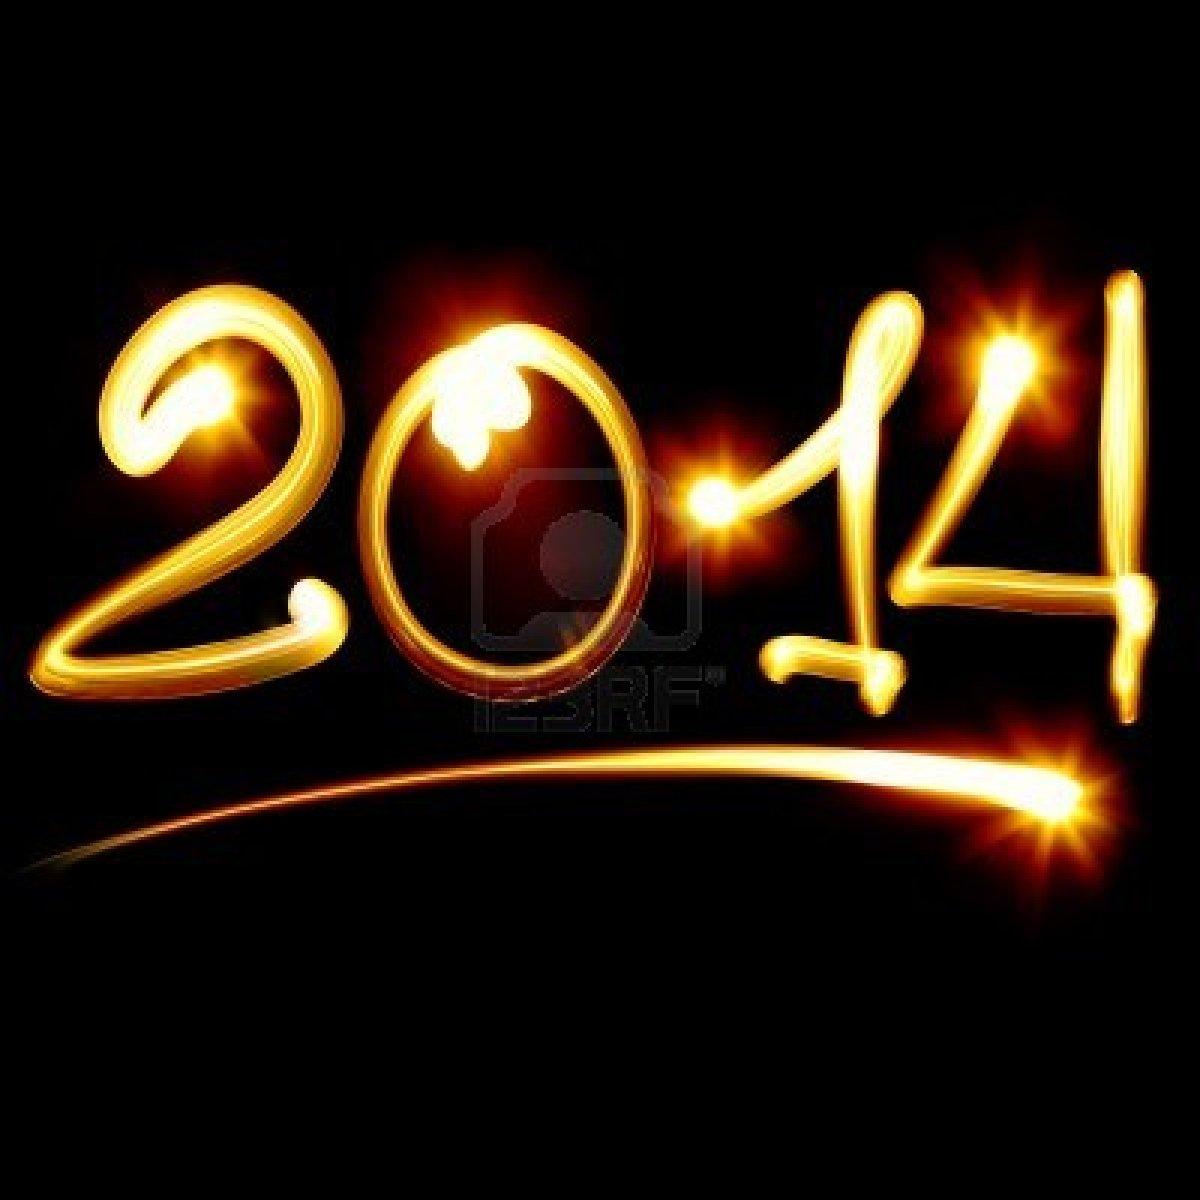 2014 >> Happy 2014 Welcome To Keystone Community Living Inc